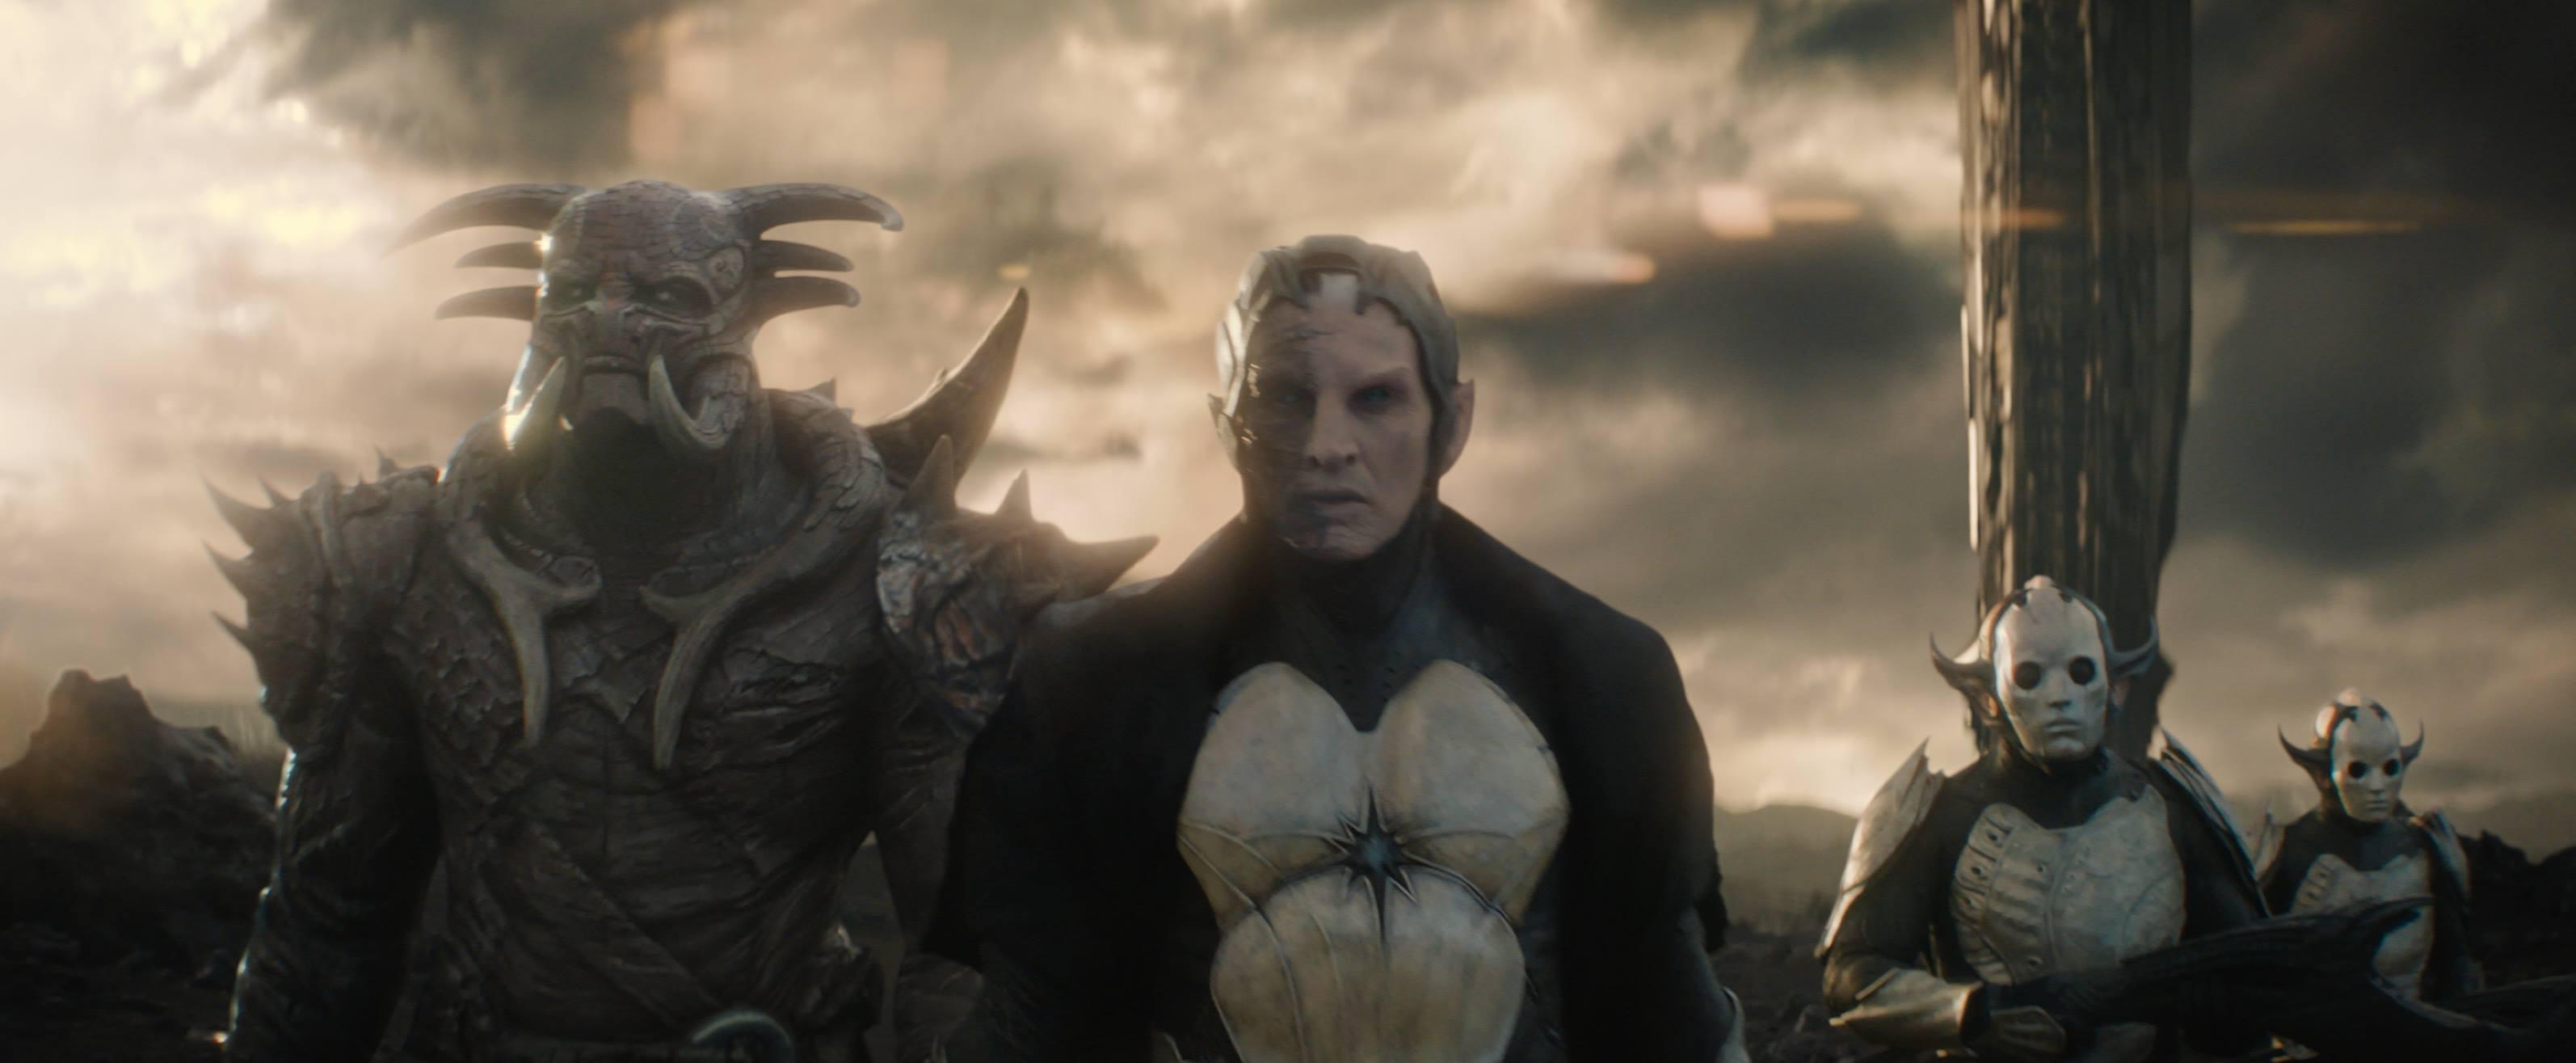 Image result for thor the dark world